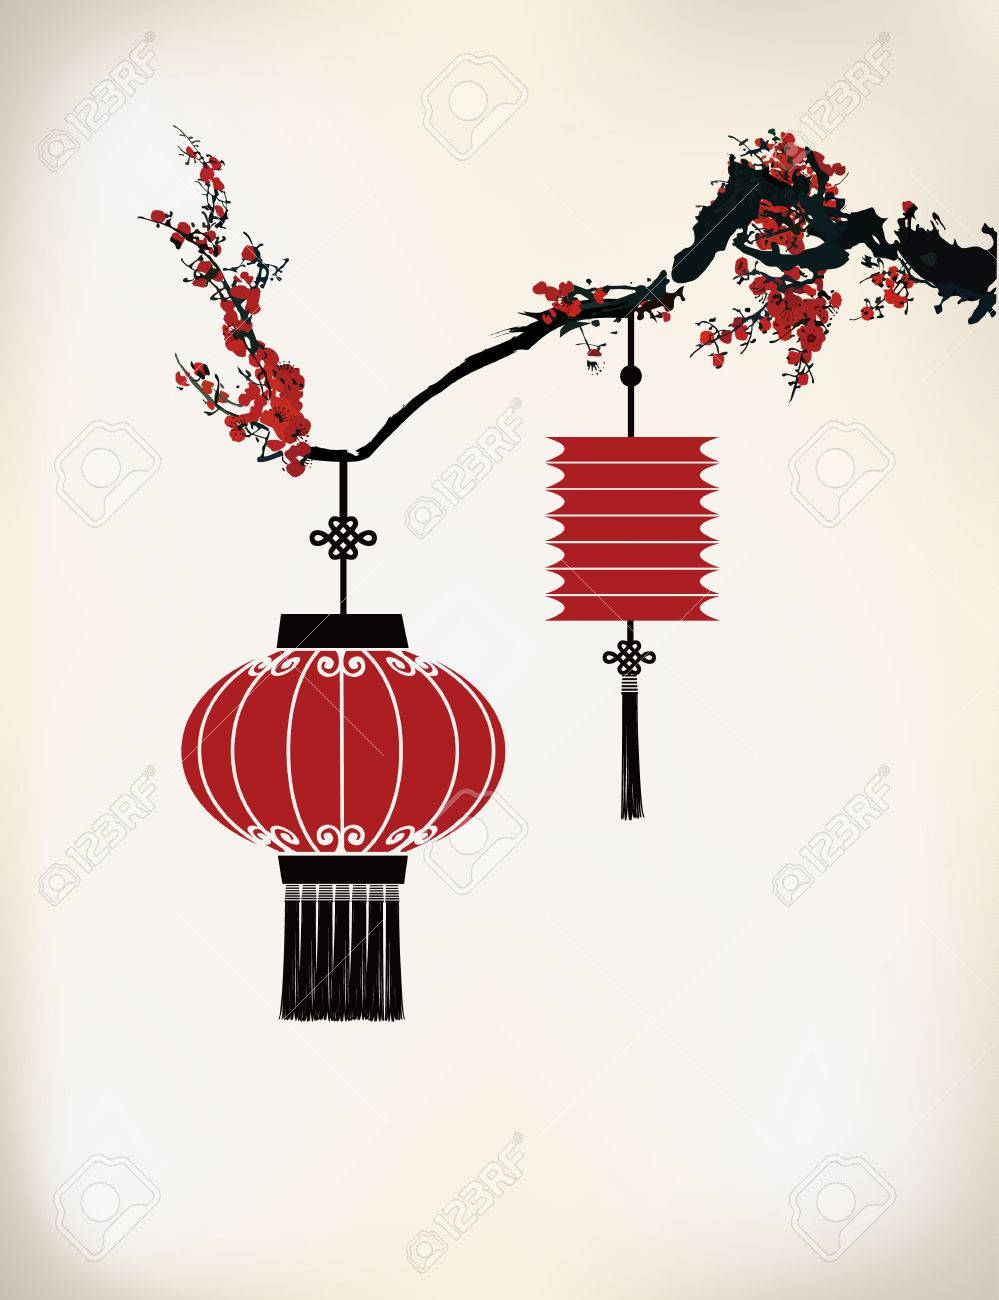 Chinese Lantern Hang On Cherry Tree Illustration